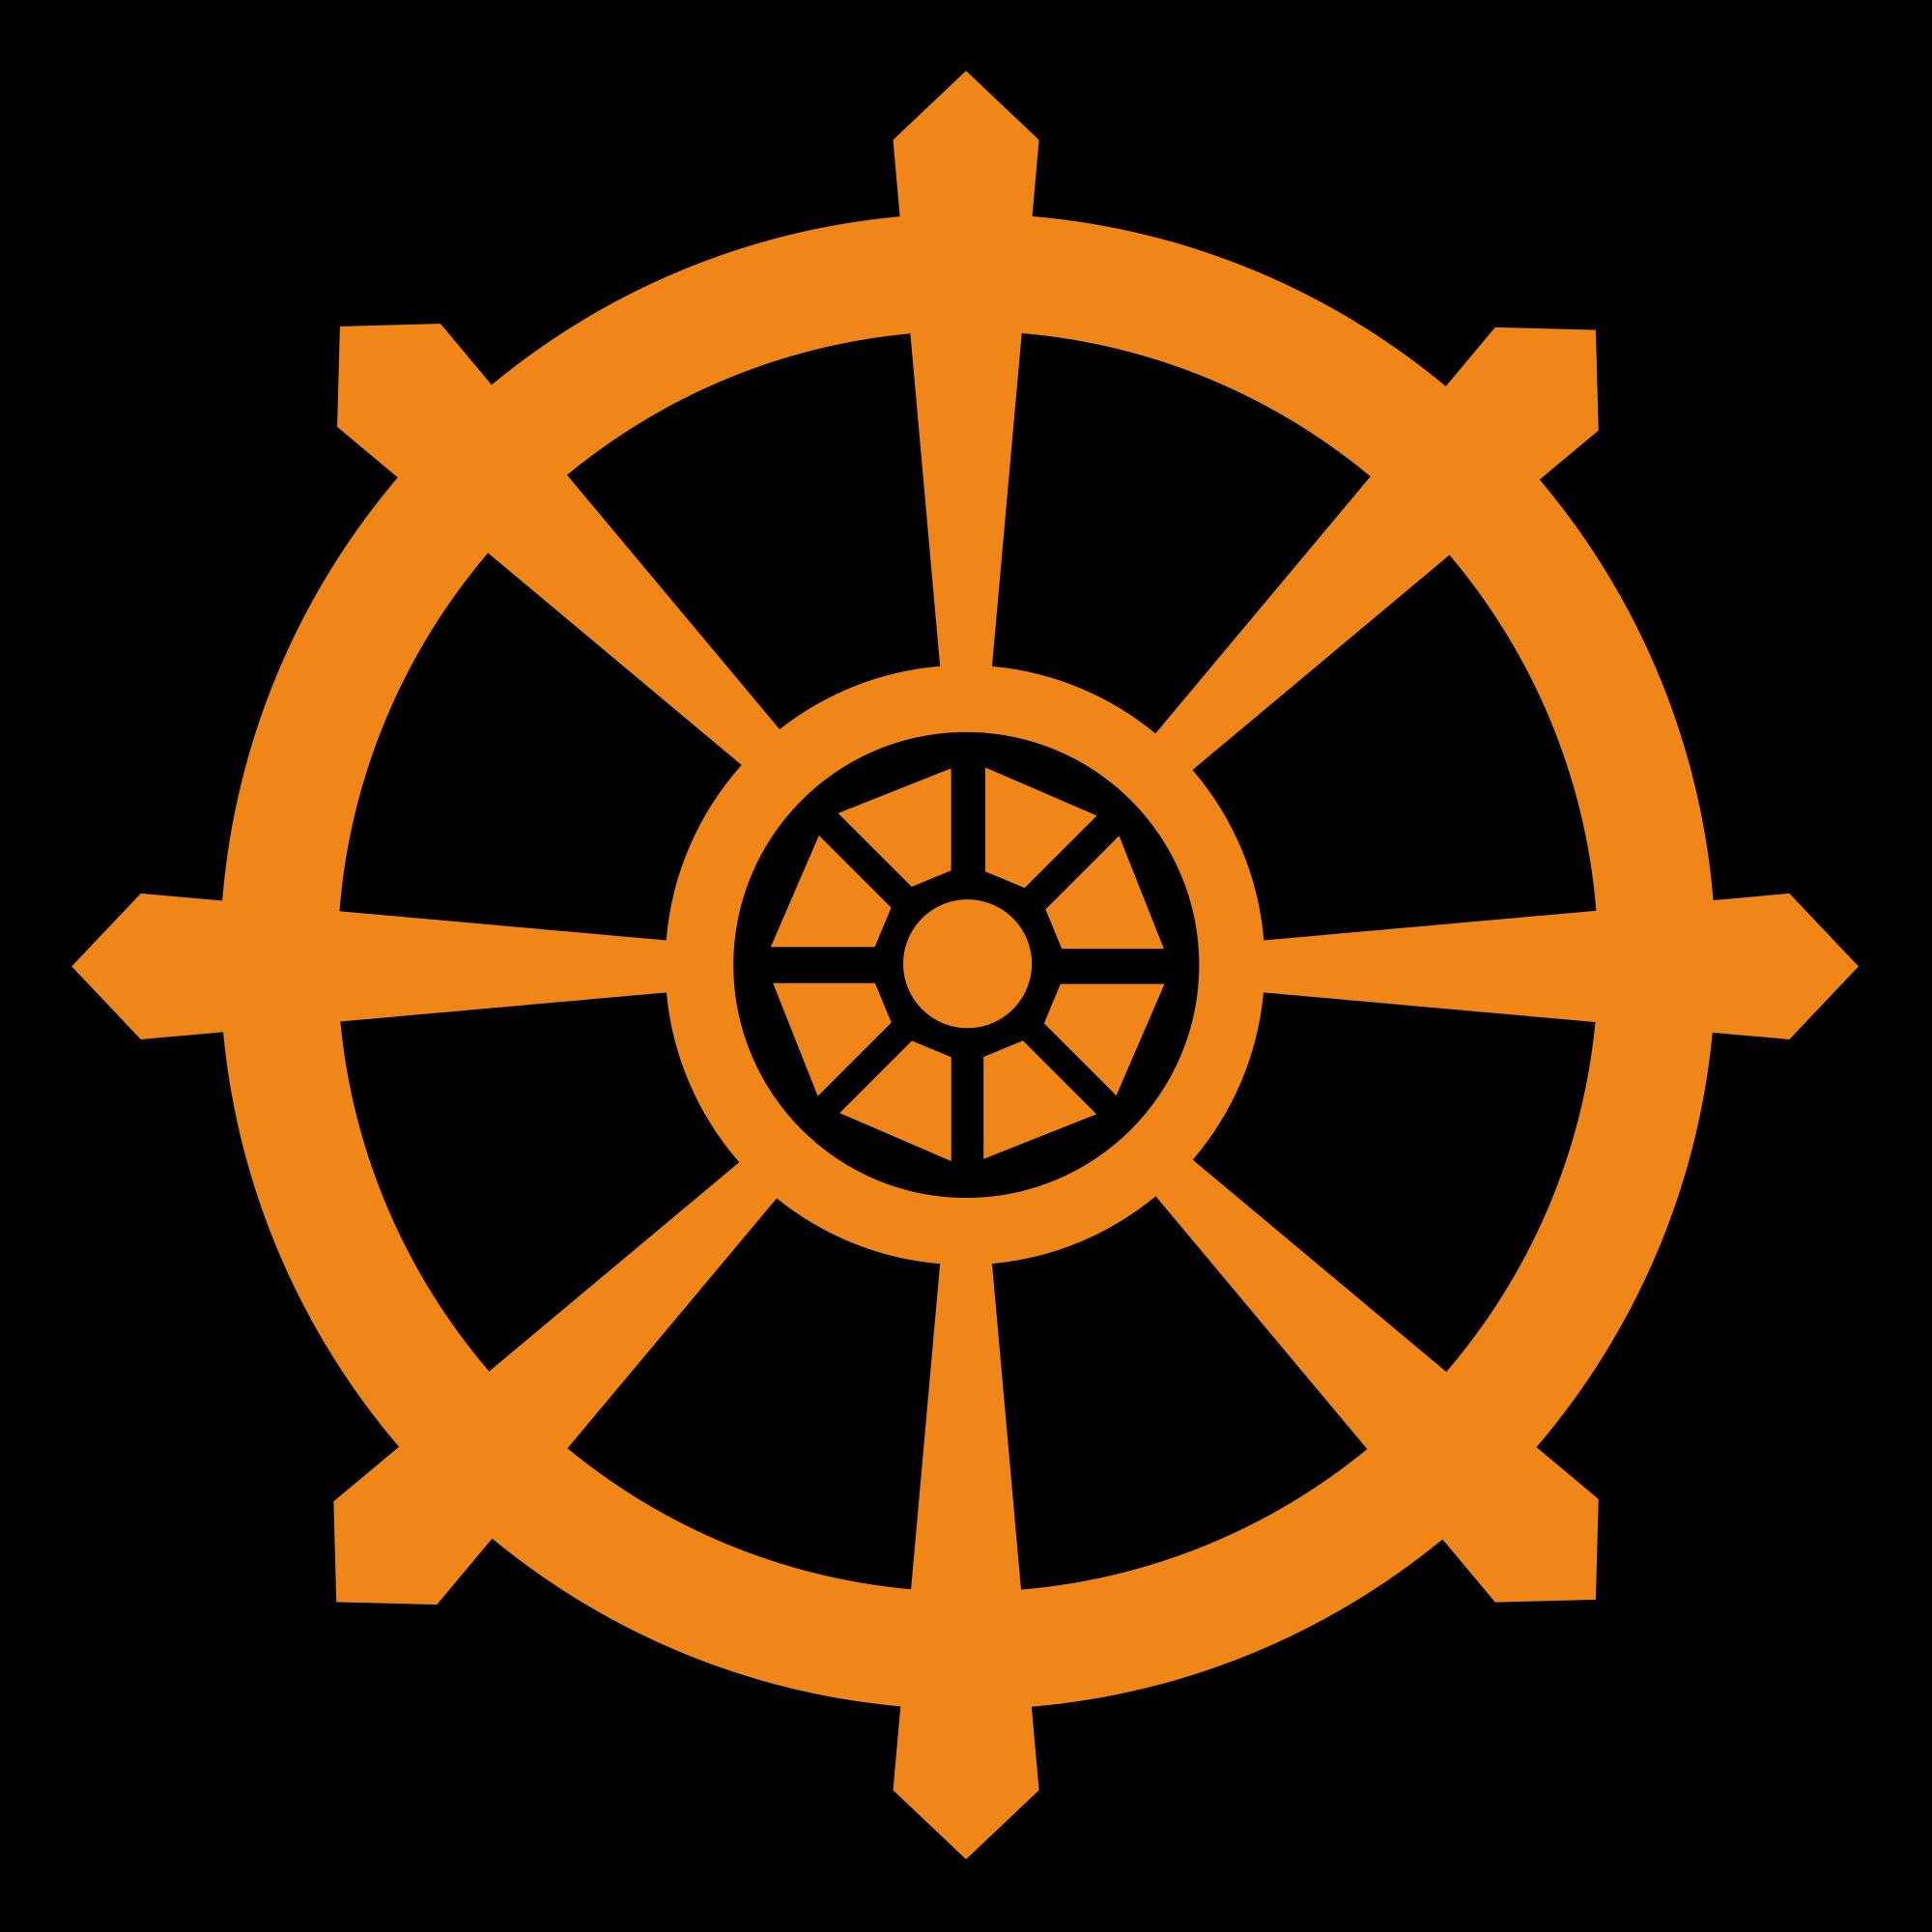 wheel of dharma hd png transparent wheel of dharma hd png images